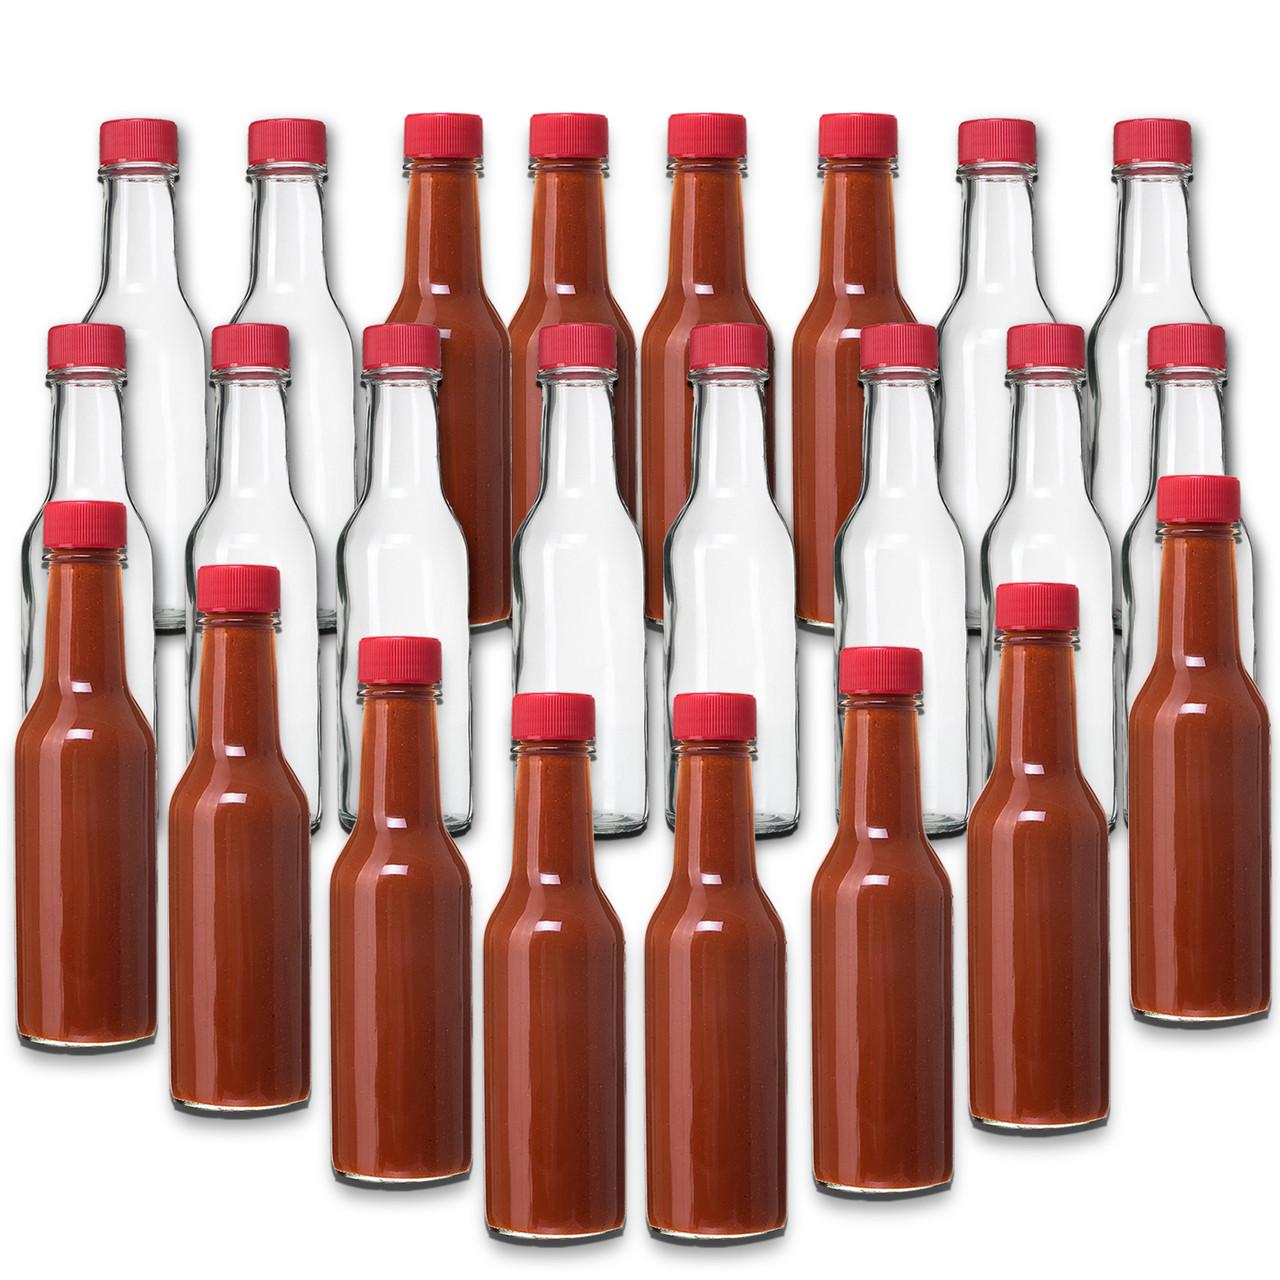 Screw Caps for 5oz Woozy Bottles Pack of 30 by nicebottles.com